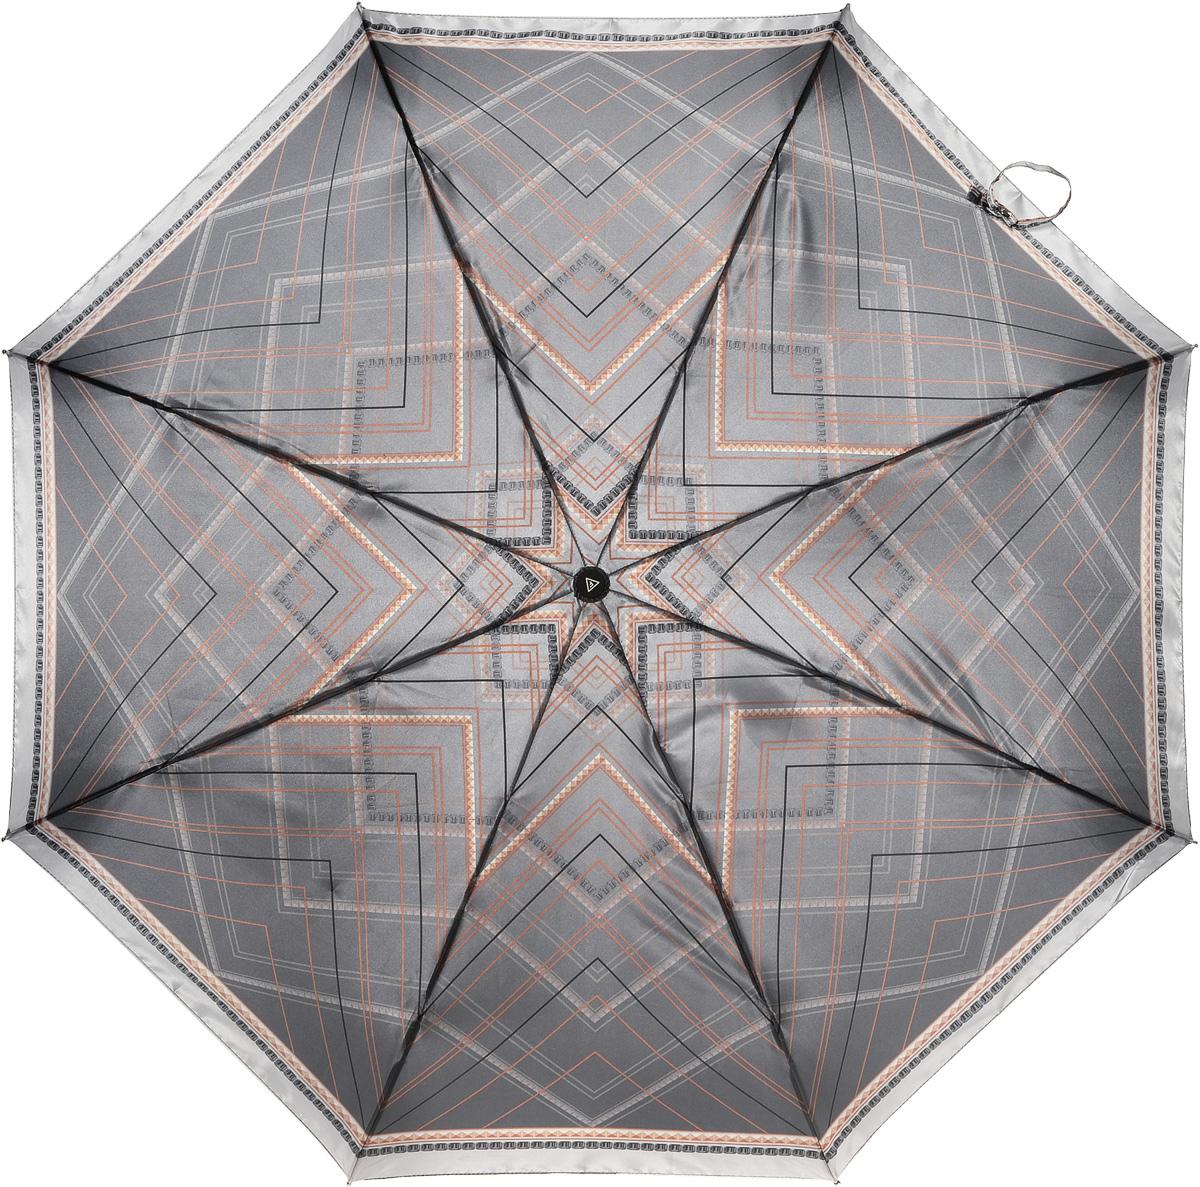 Зонт женский Fabretti, автомат, 3 сложения, цвет: коричневый. L-16106-14L-16106-14Зонт женский Fabretti, облегченный суперавтомат, 3 сложения